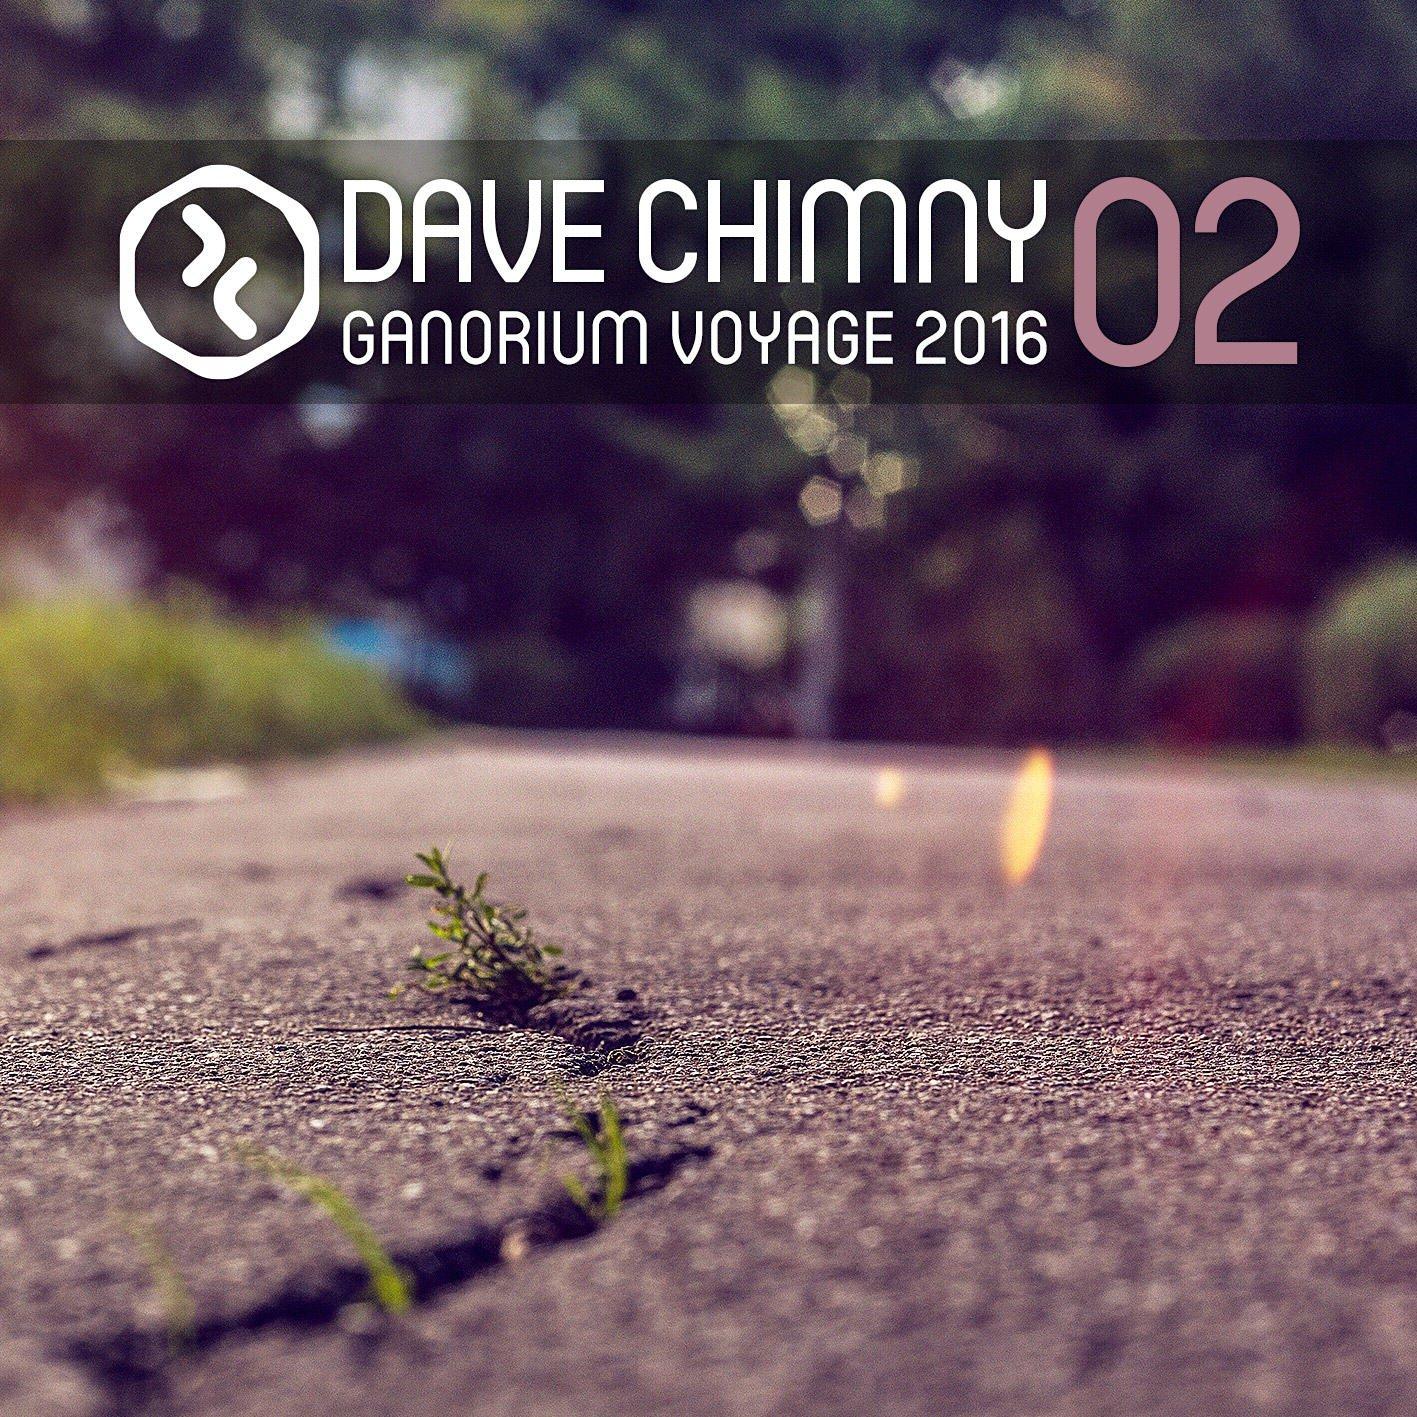 Dave Chimny – Ganorium Voyage 2016-02